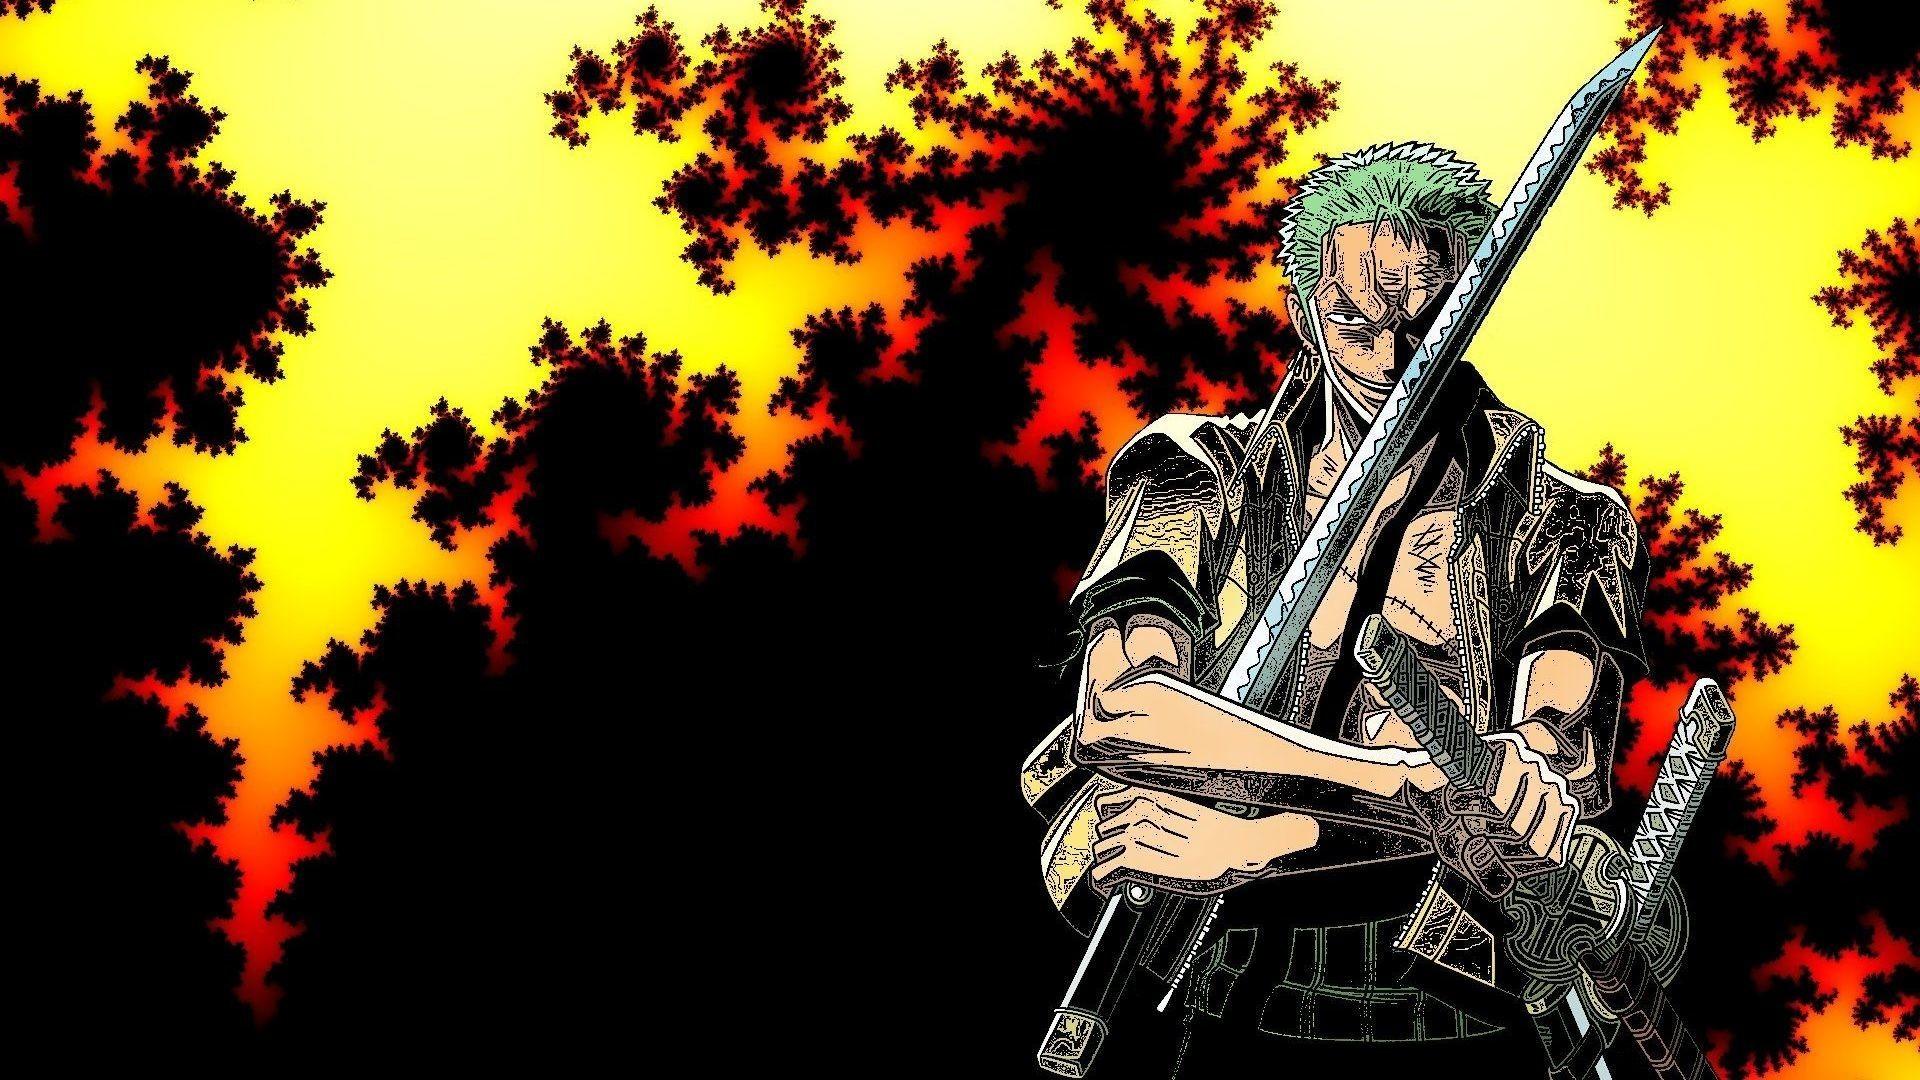 Zoro One Piece Wallpaper 4K